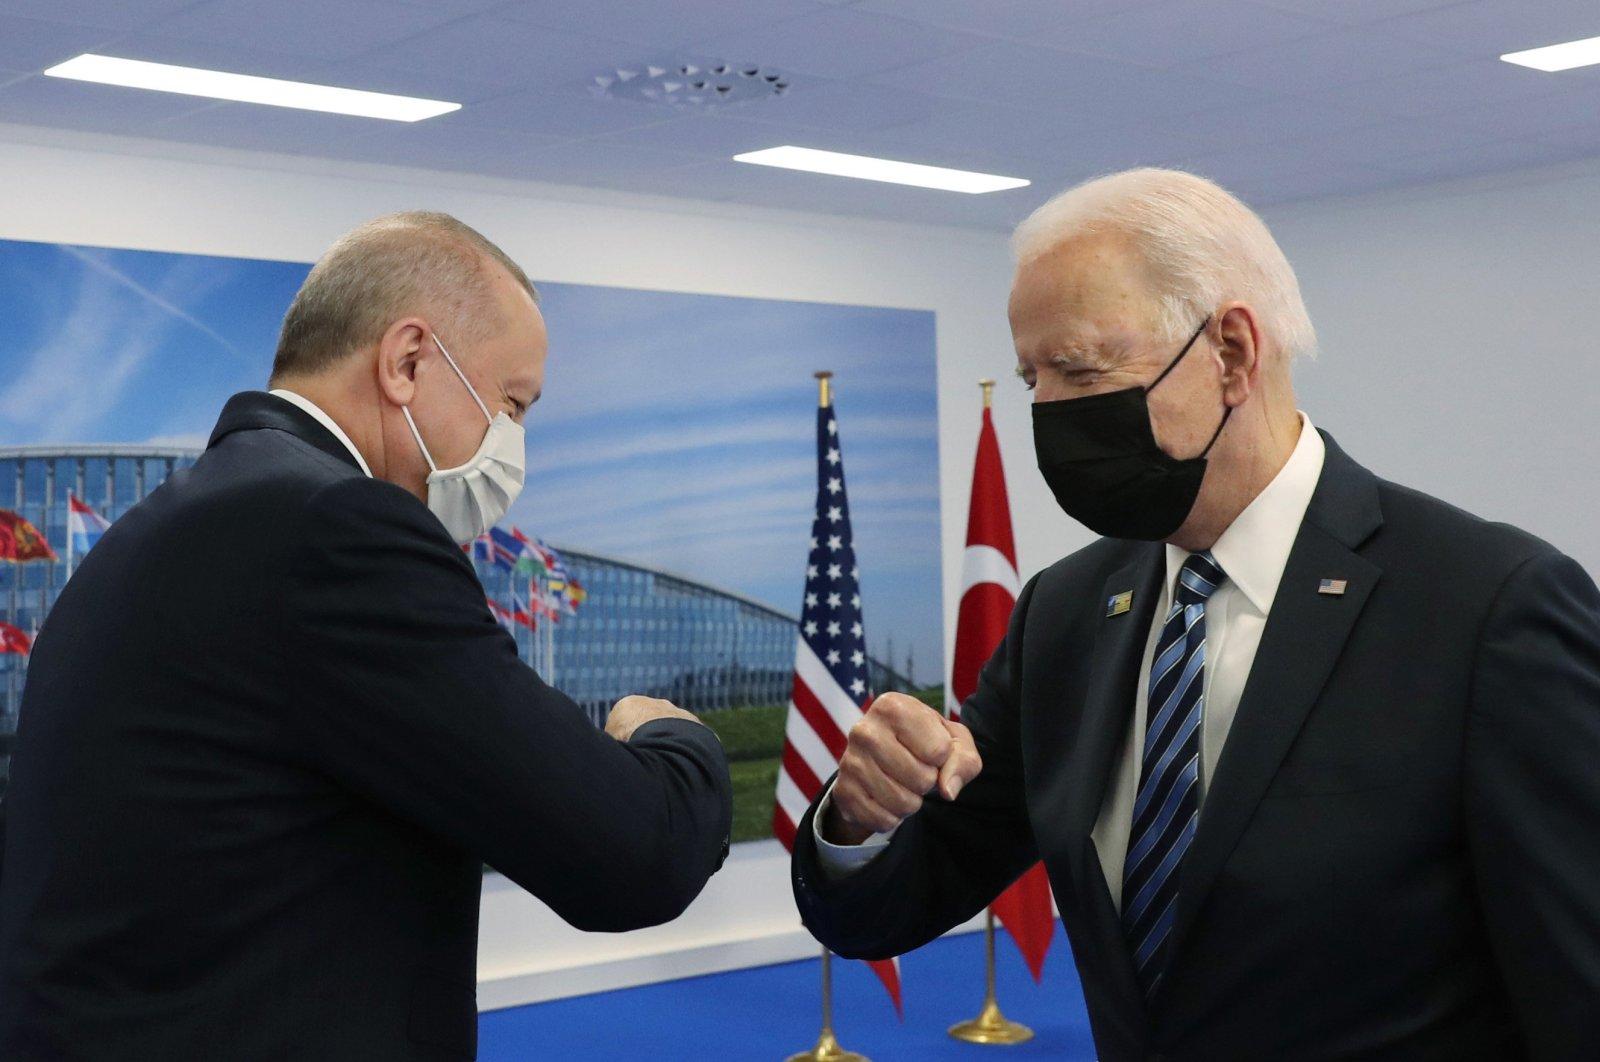 U.S. President Joe Biden (R) is seen with Turkish President Recep Tayyip Erdoğan prior to a plenary session of the recent NATO summit at NATO headquarters, Brussels, Belgium, June 14, 2021. (AA Photo)